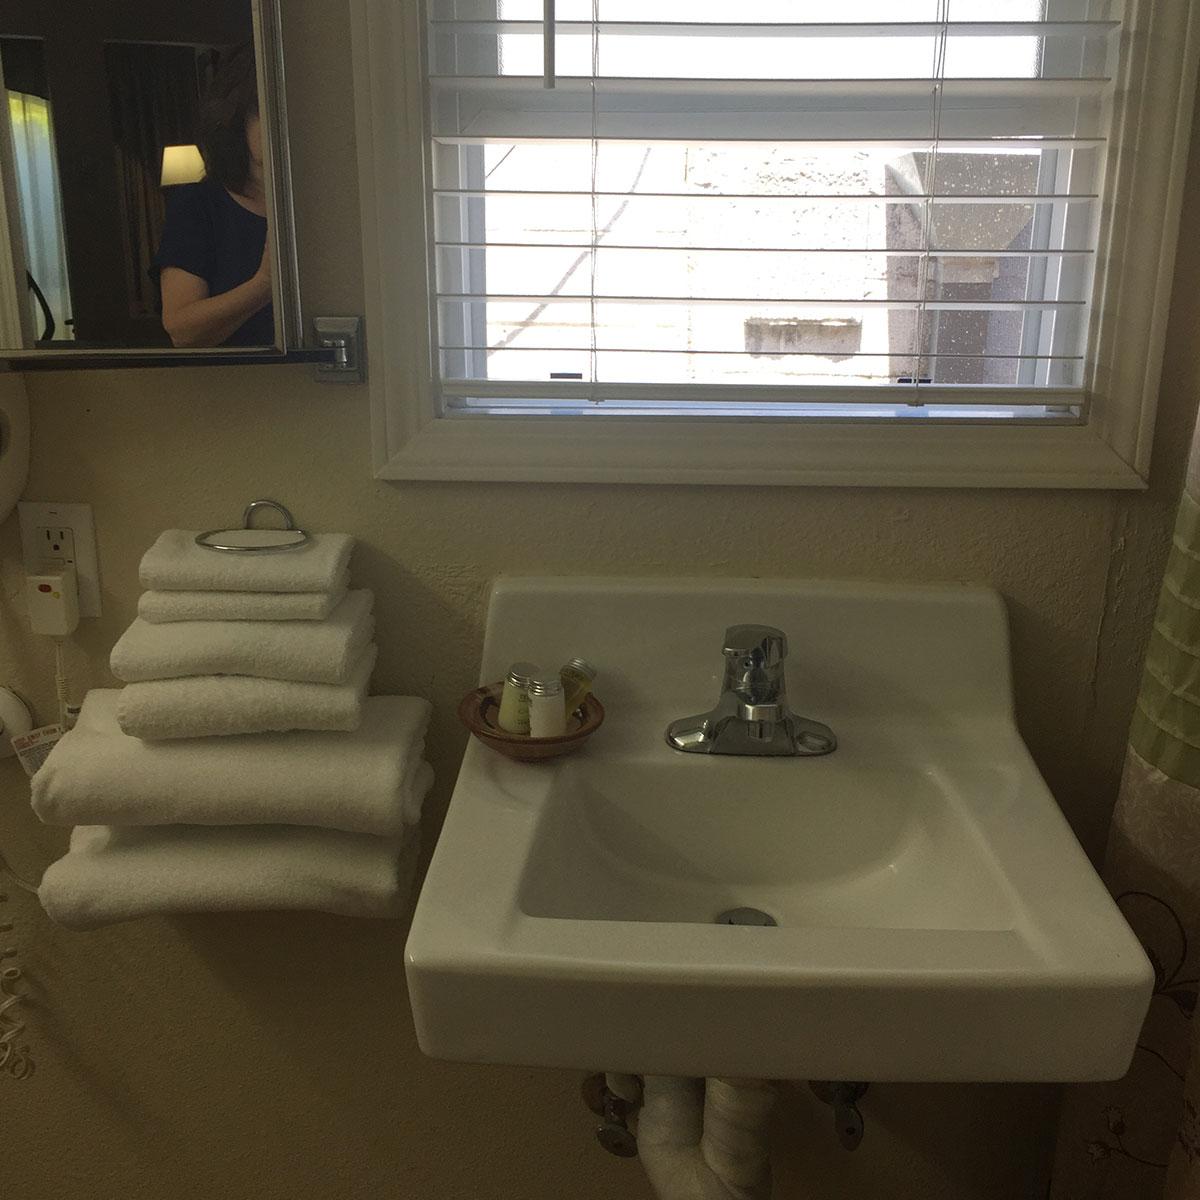 ADA-sink-with-low-towel-bars